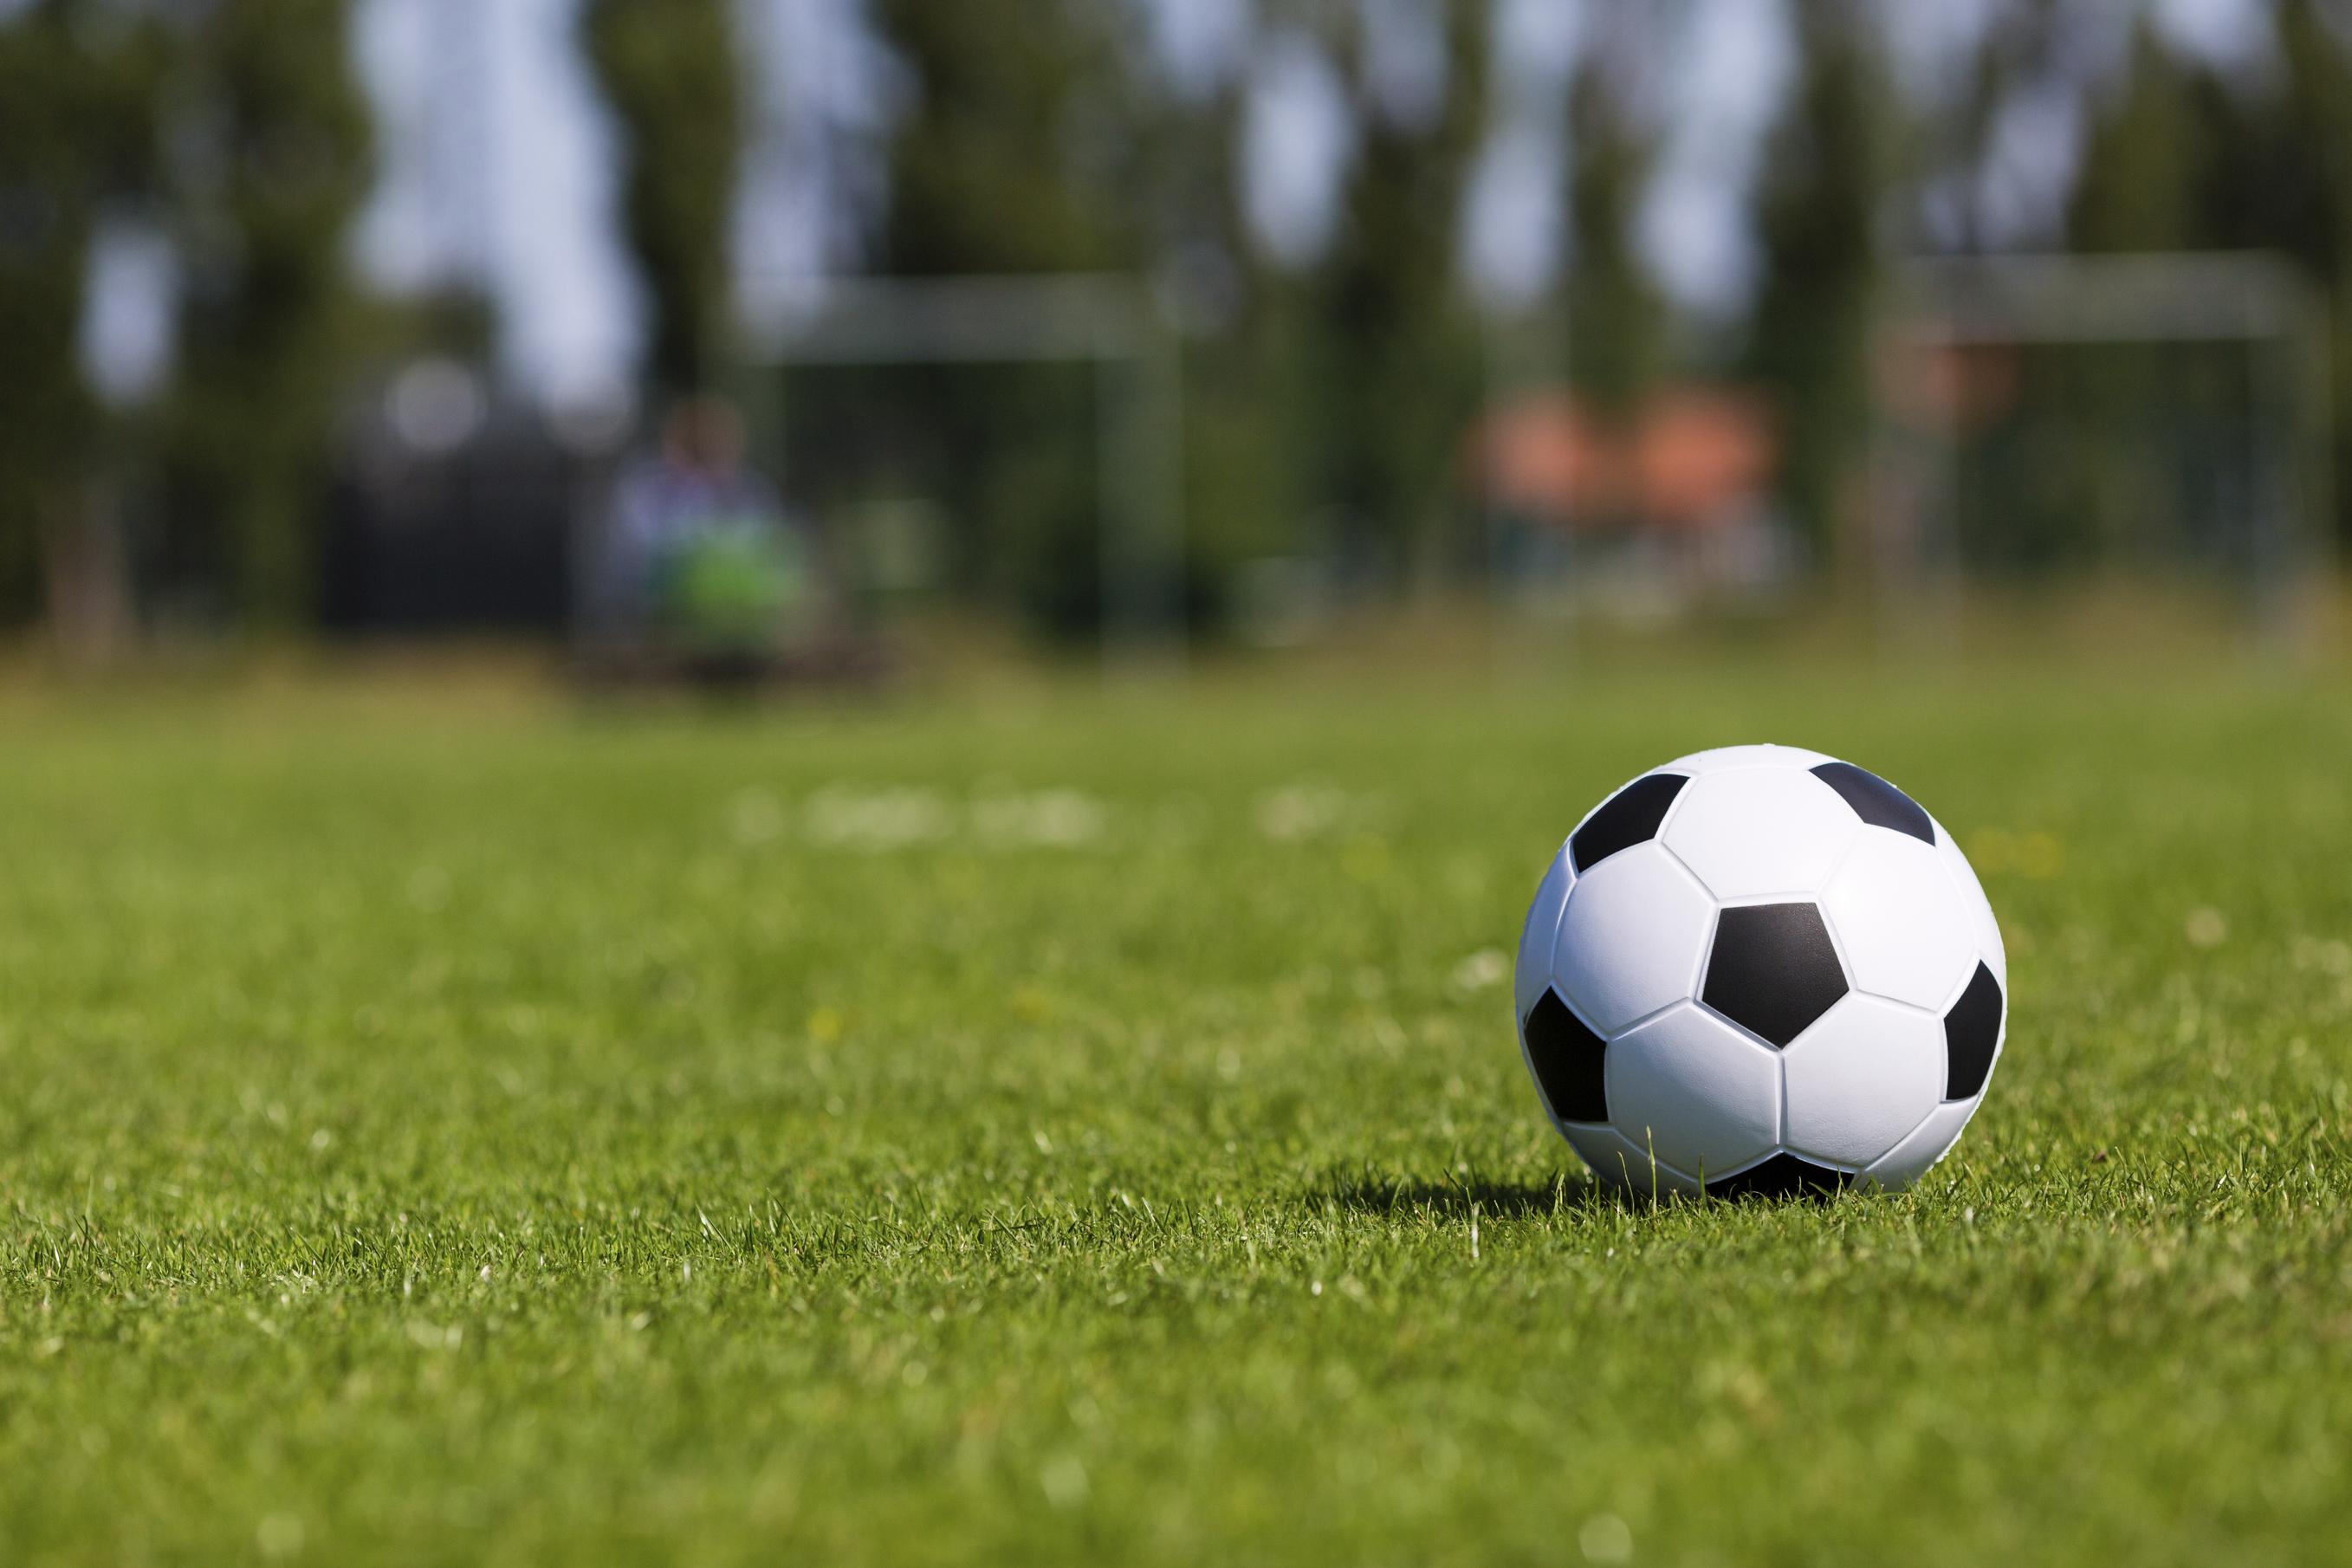 South Sudan calls time on domestic football season - Sports Leo